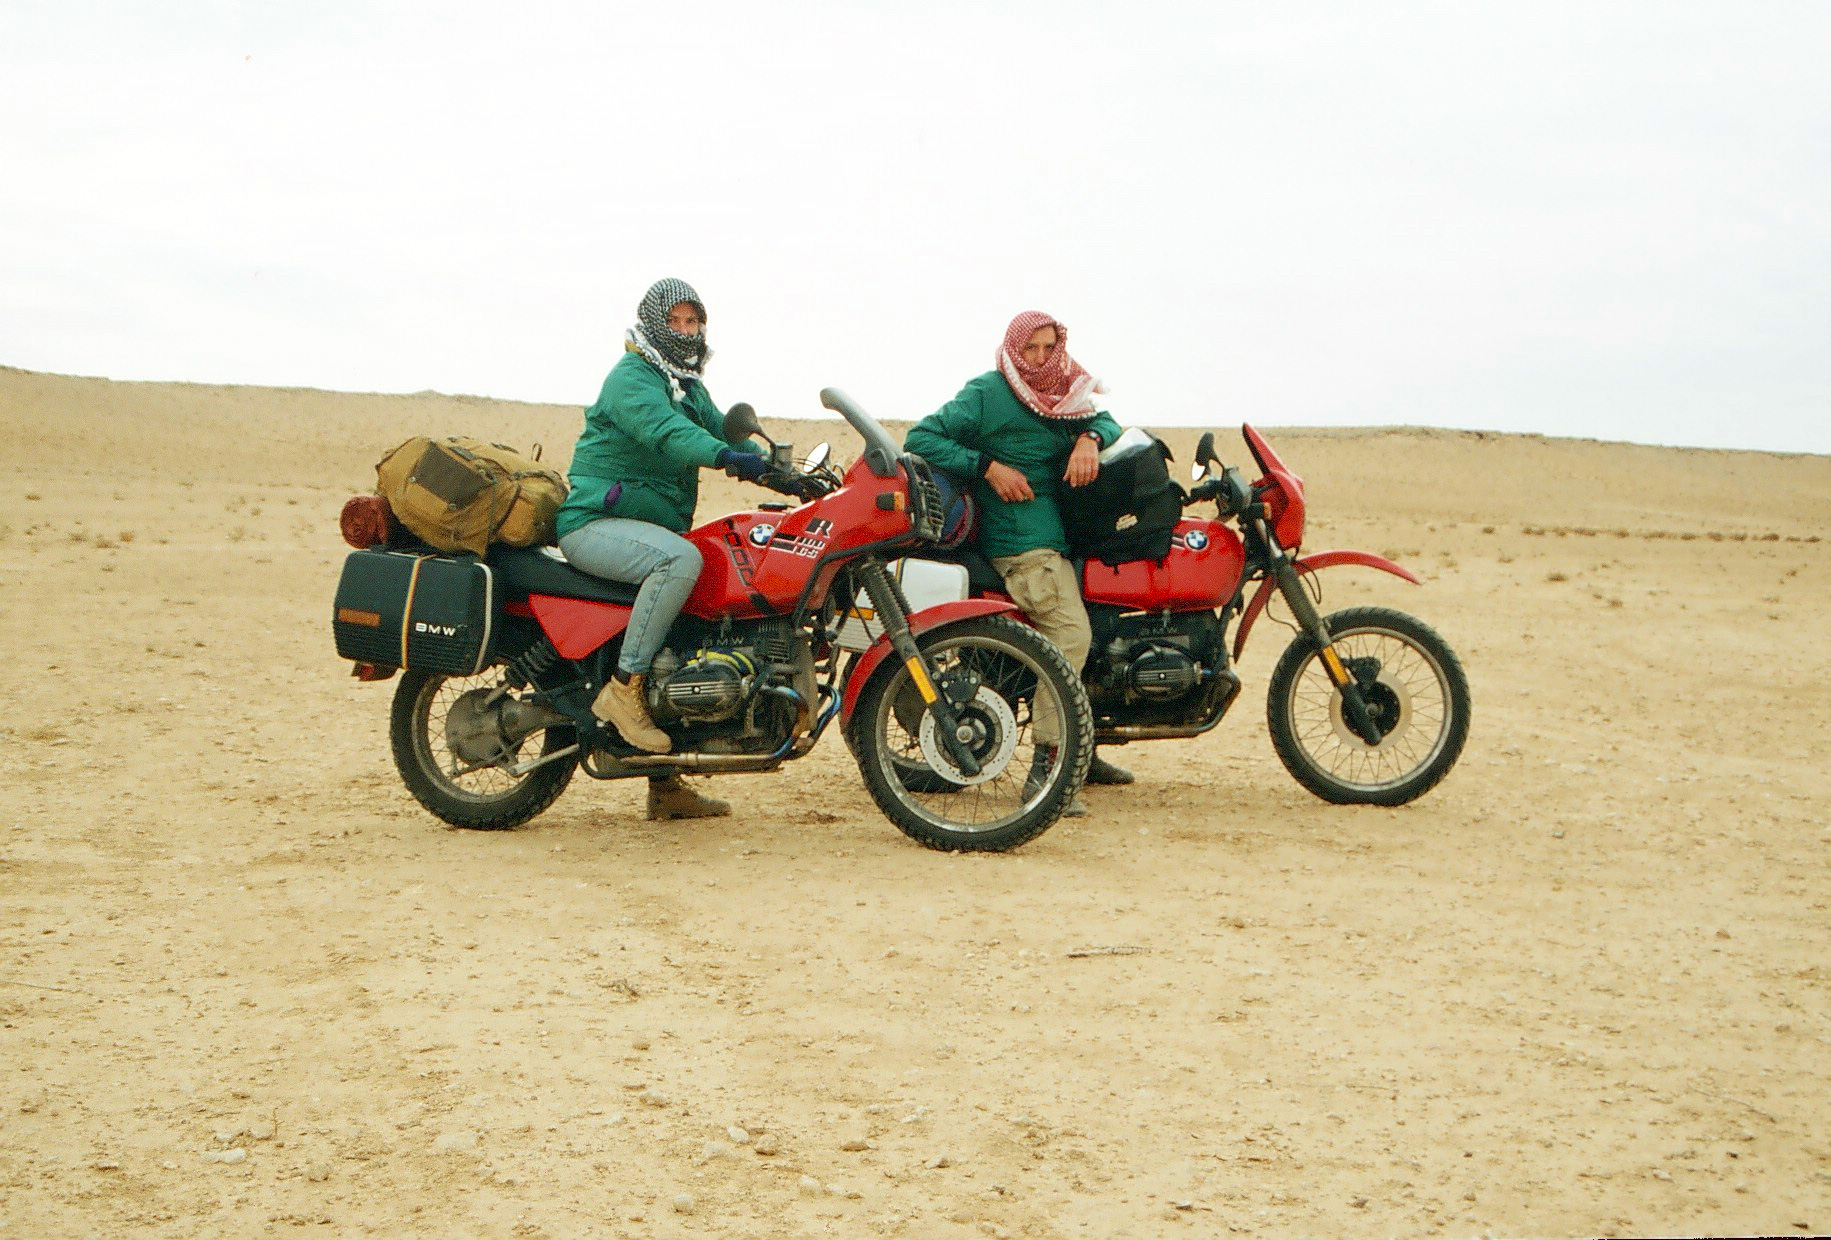 road-trip_olives-et-al_gastro-worldwide.jpg